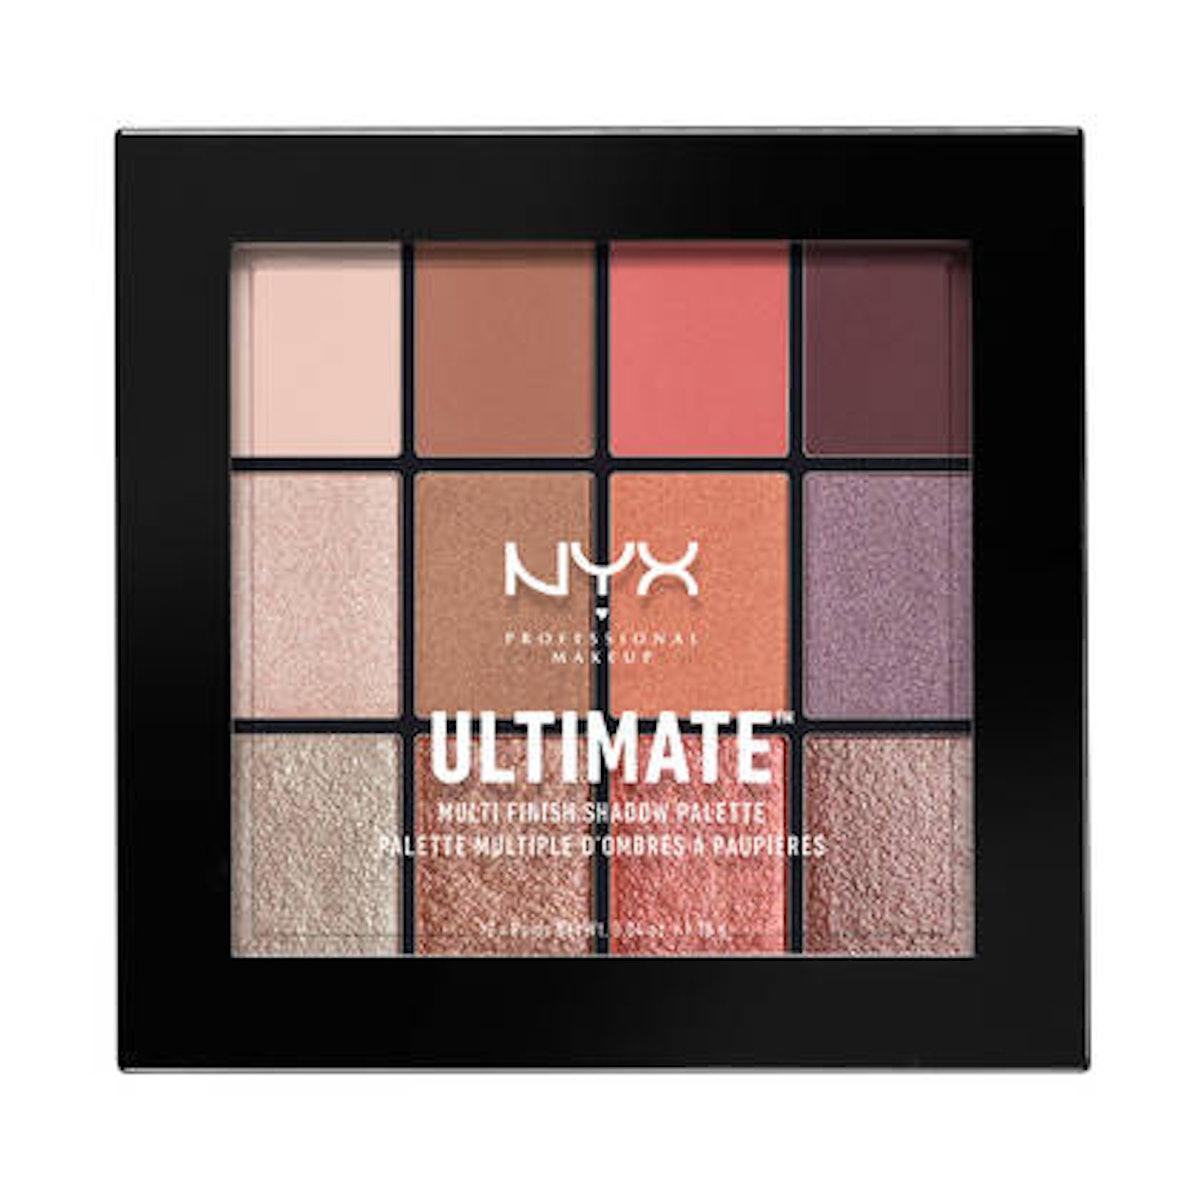 Ultimate Multi-Finish Shadow Palette in Warm Rust